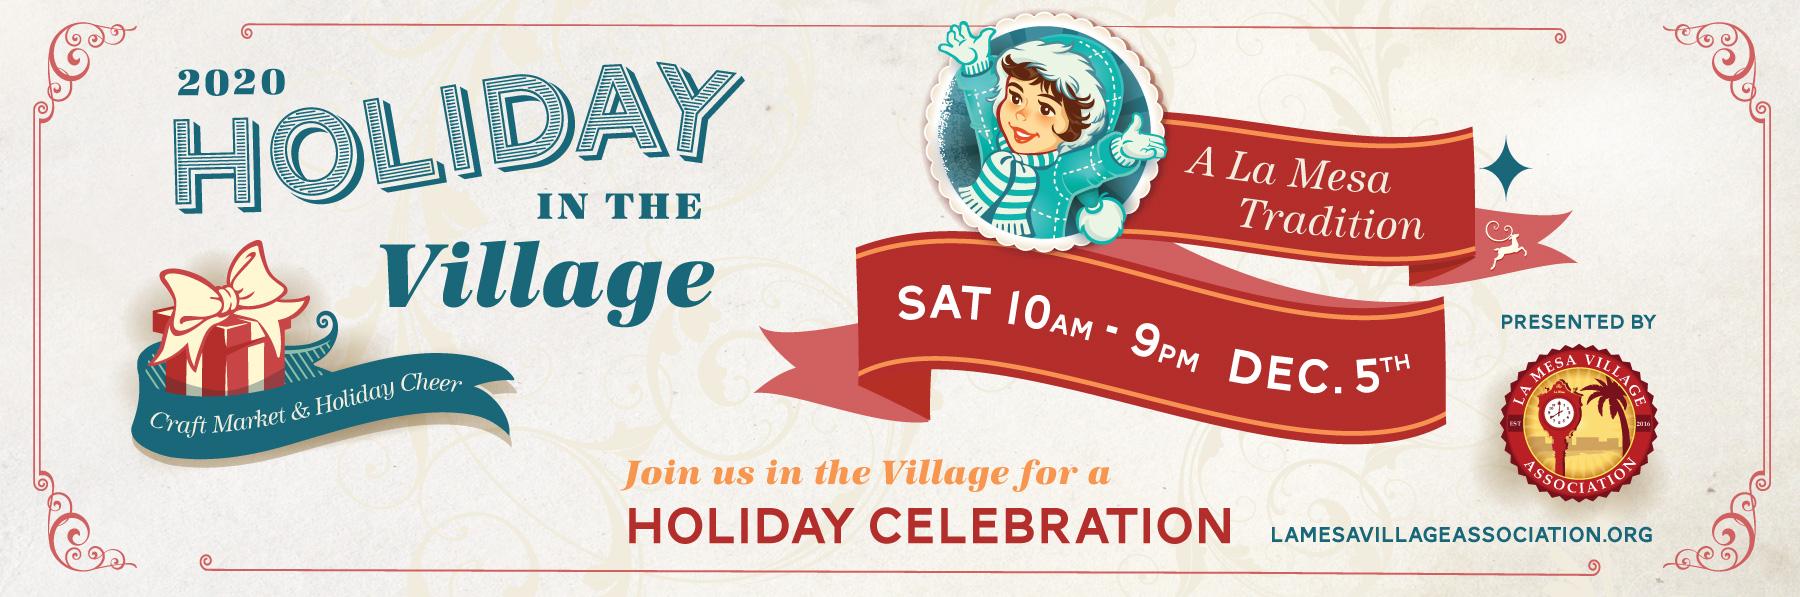 La Mesa Christmas In The Village 2020 Holiday in the Village, A La Mesa Tradition